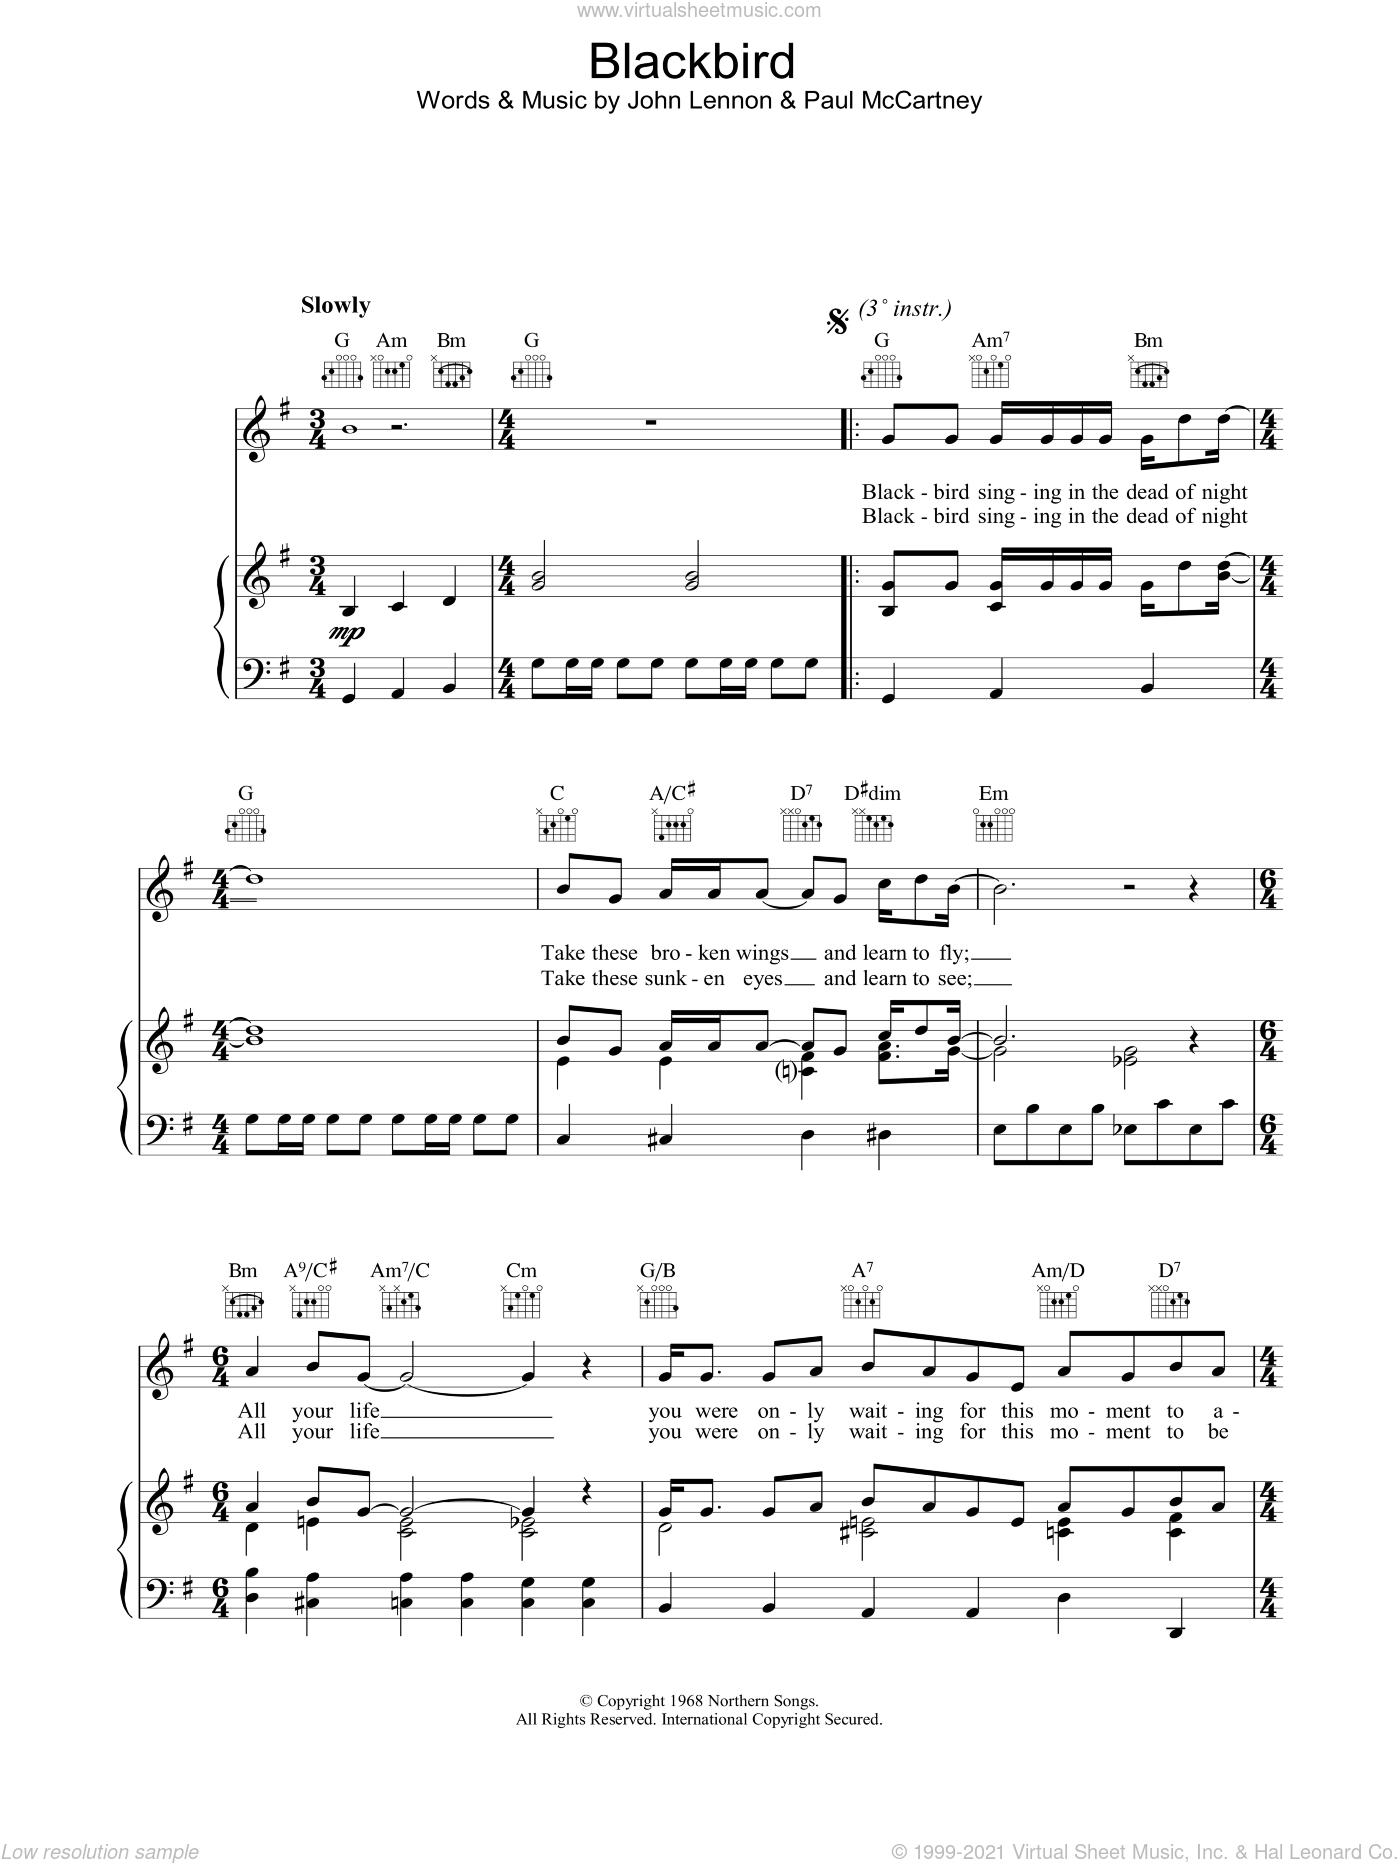 Blackbird sheet music for voice, piano or guitar by The Beatles, John Lennon and Paul McCartney, intermediate skill level